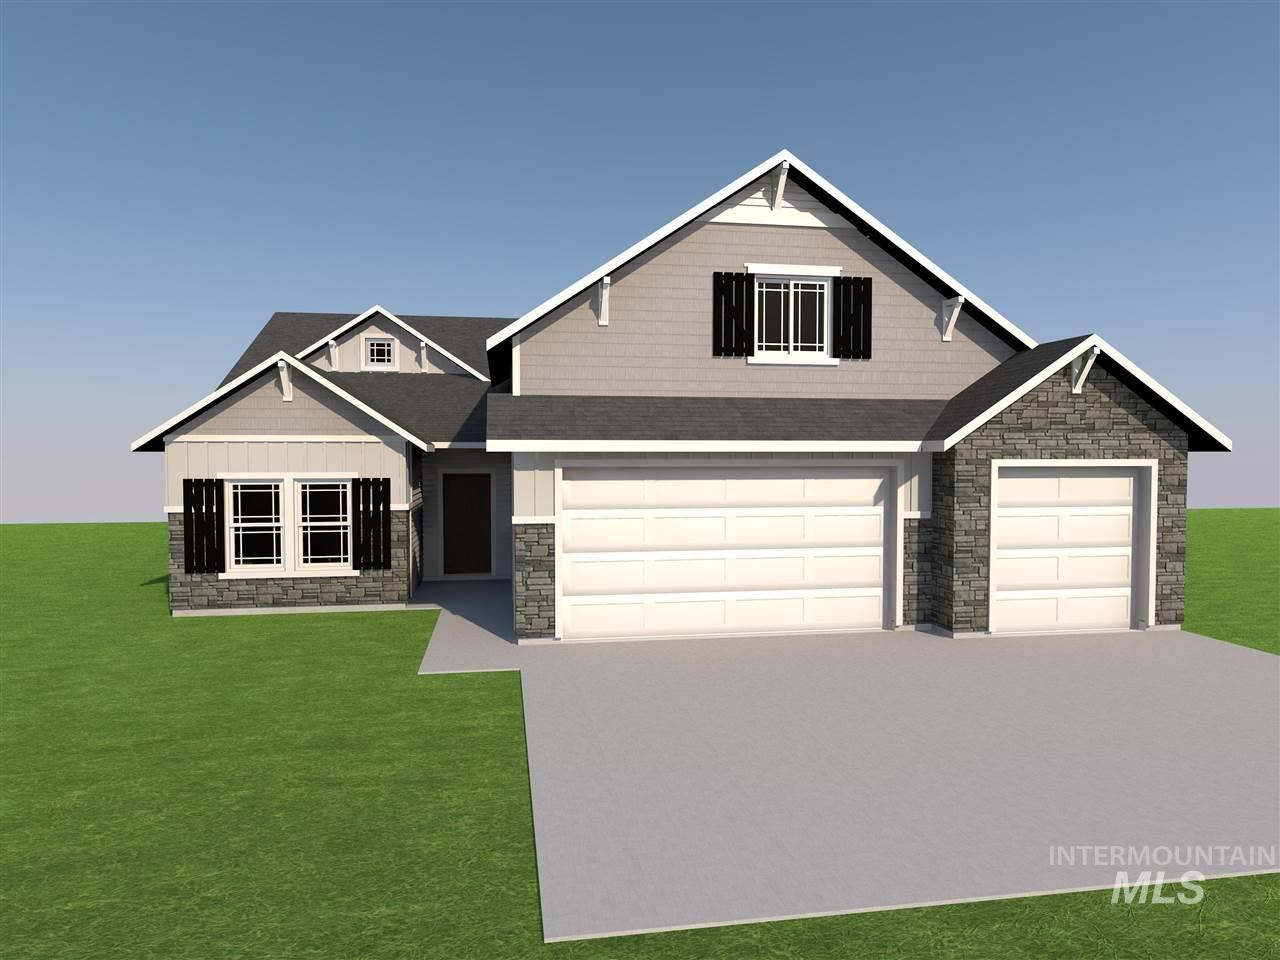 804 Broadmoor Avenue, Twin Falls, ID 83301 - MLS#: 98763097